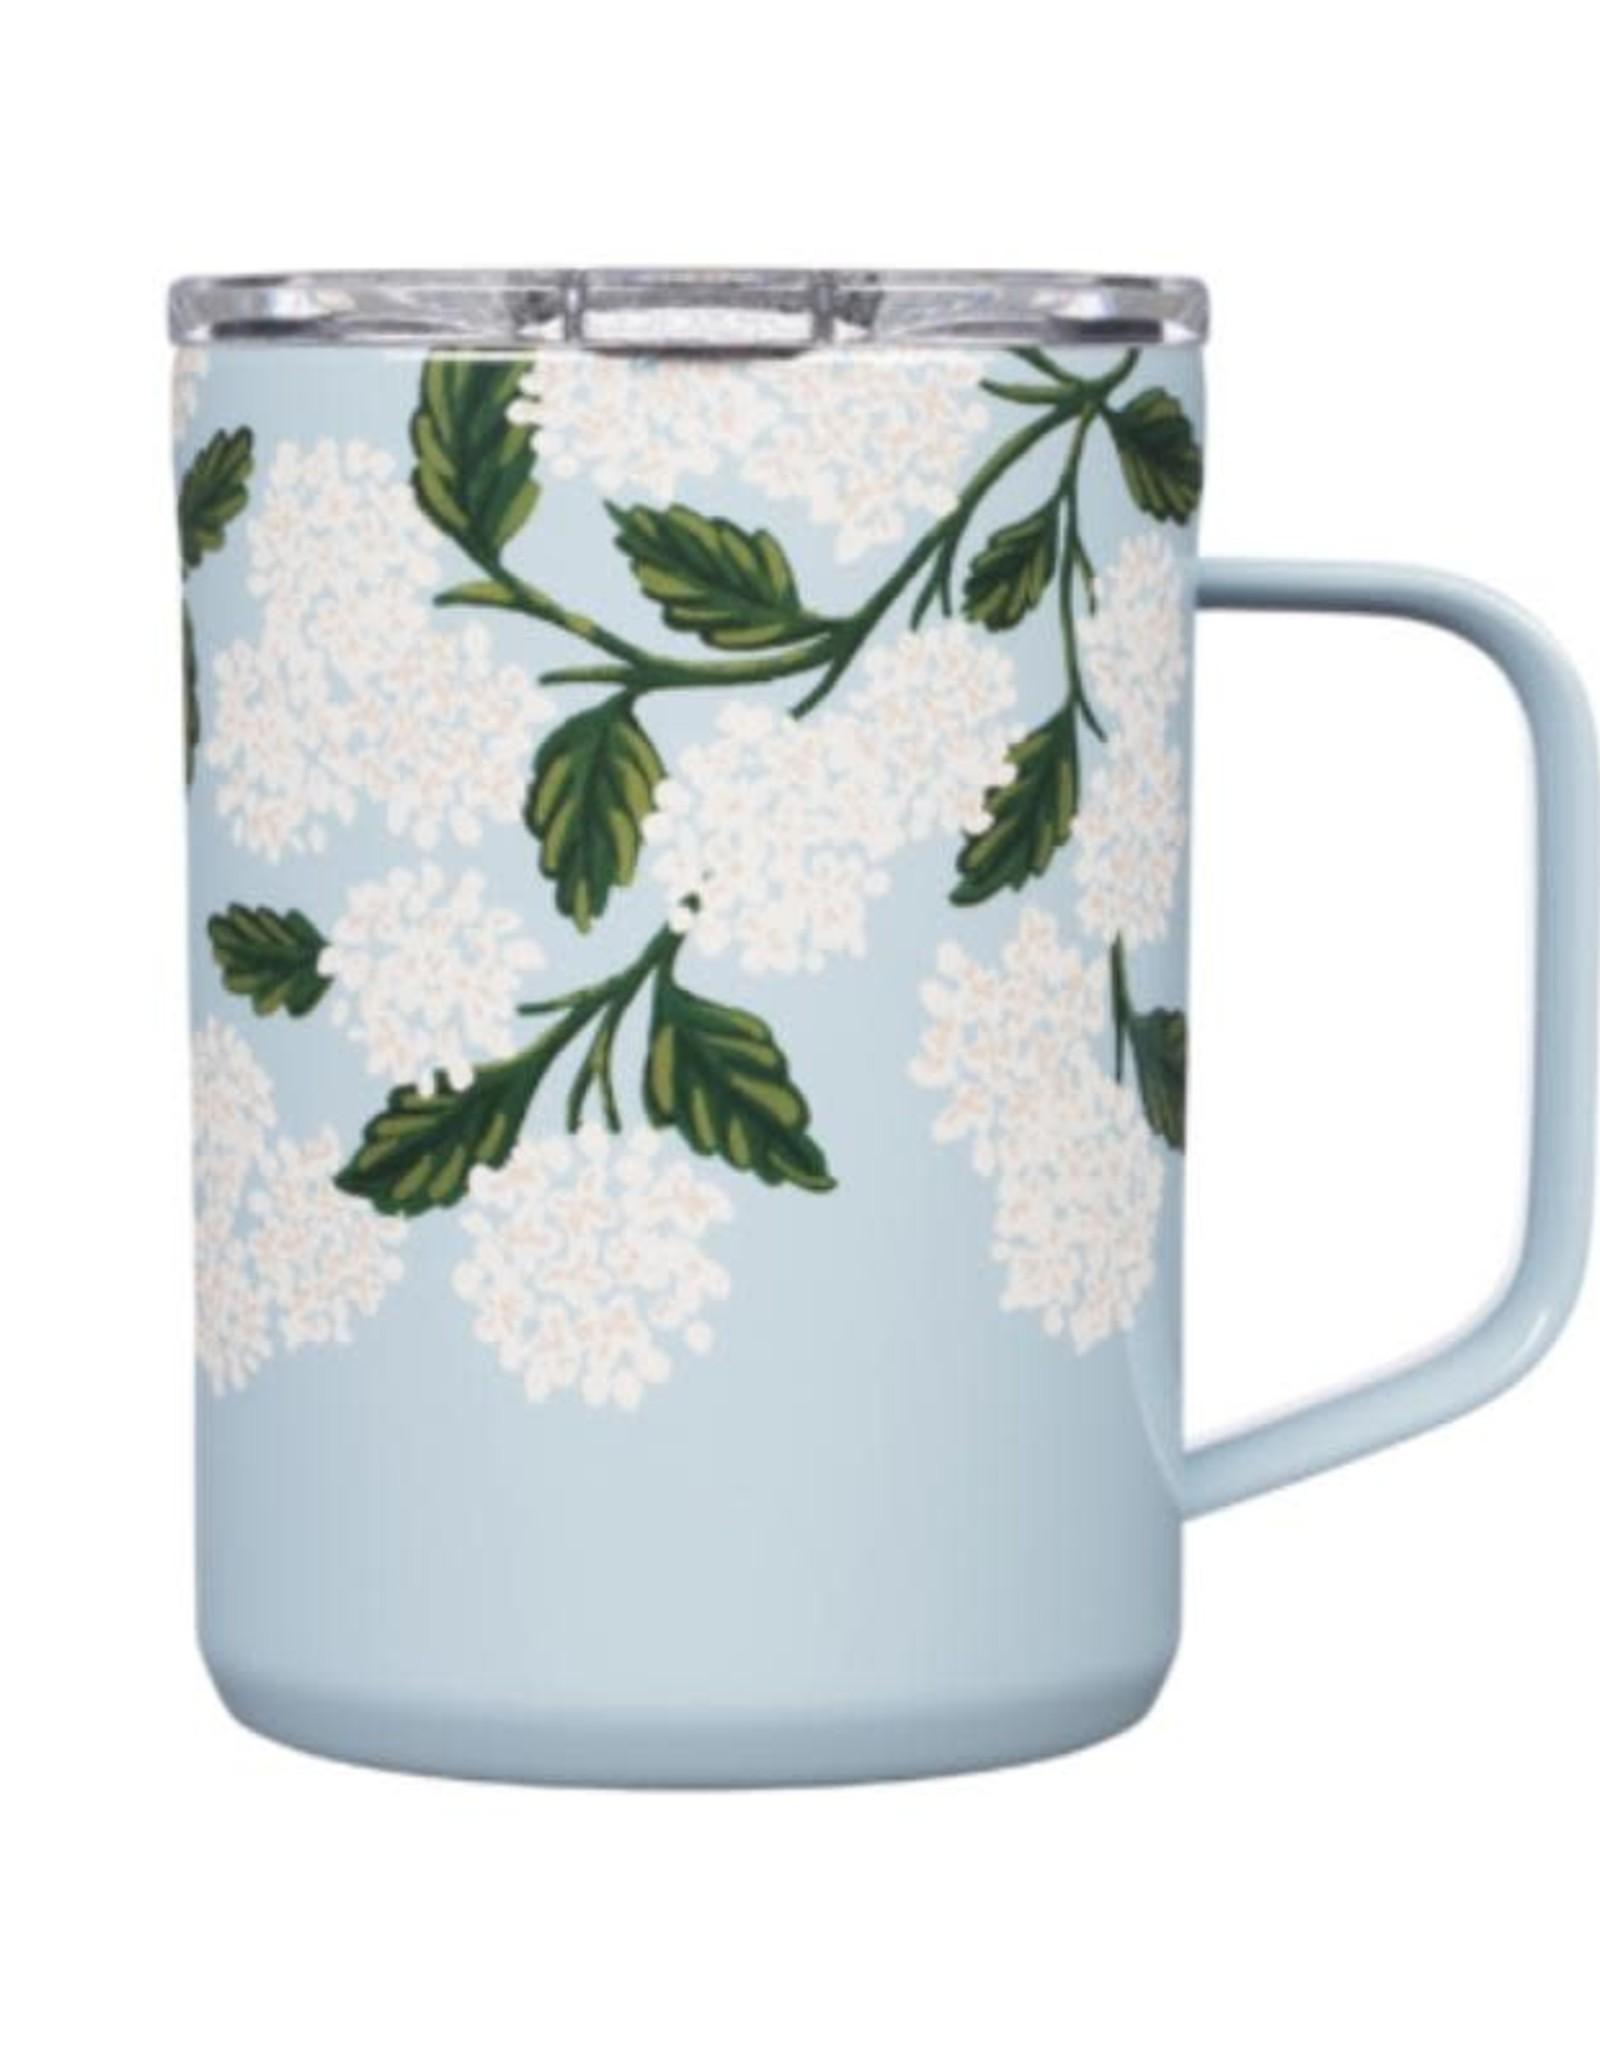 Corkcicle Mug Blue Hydrangea